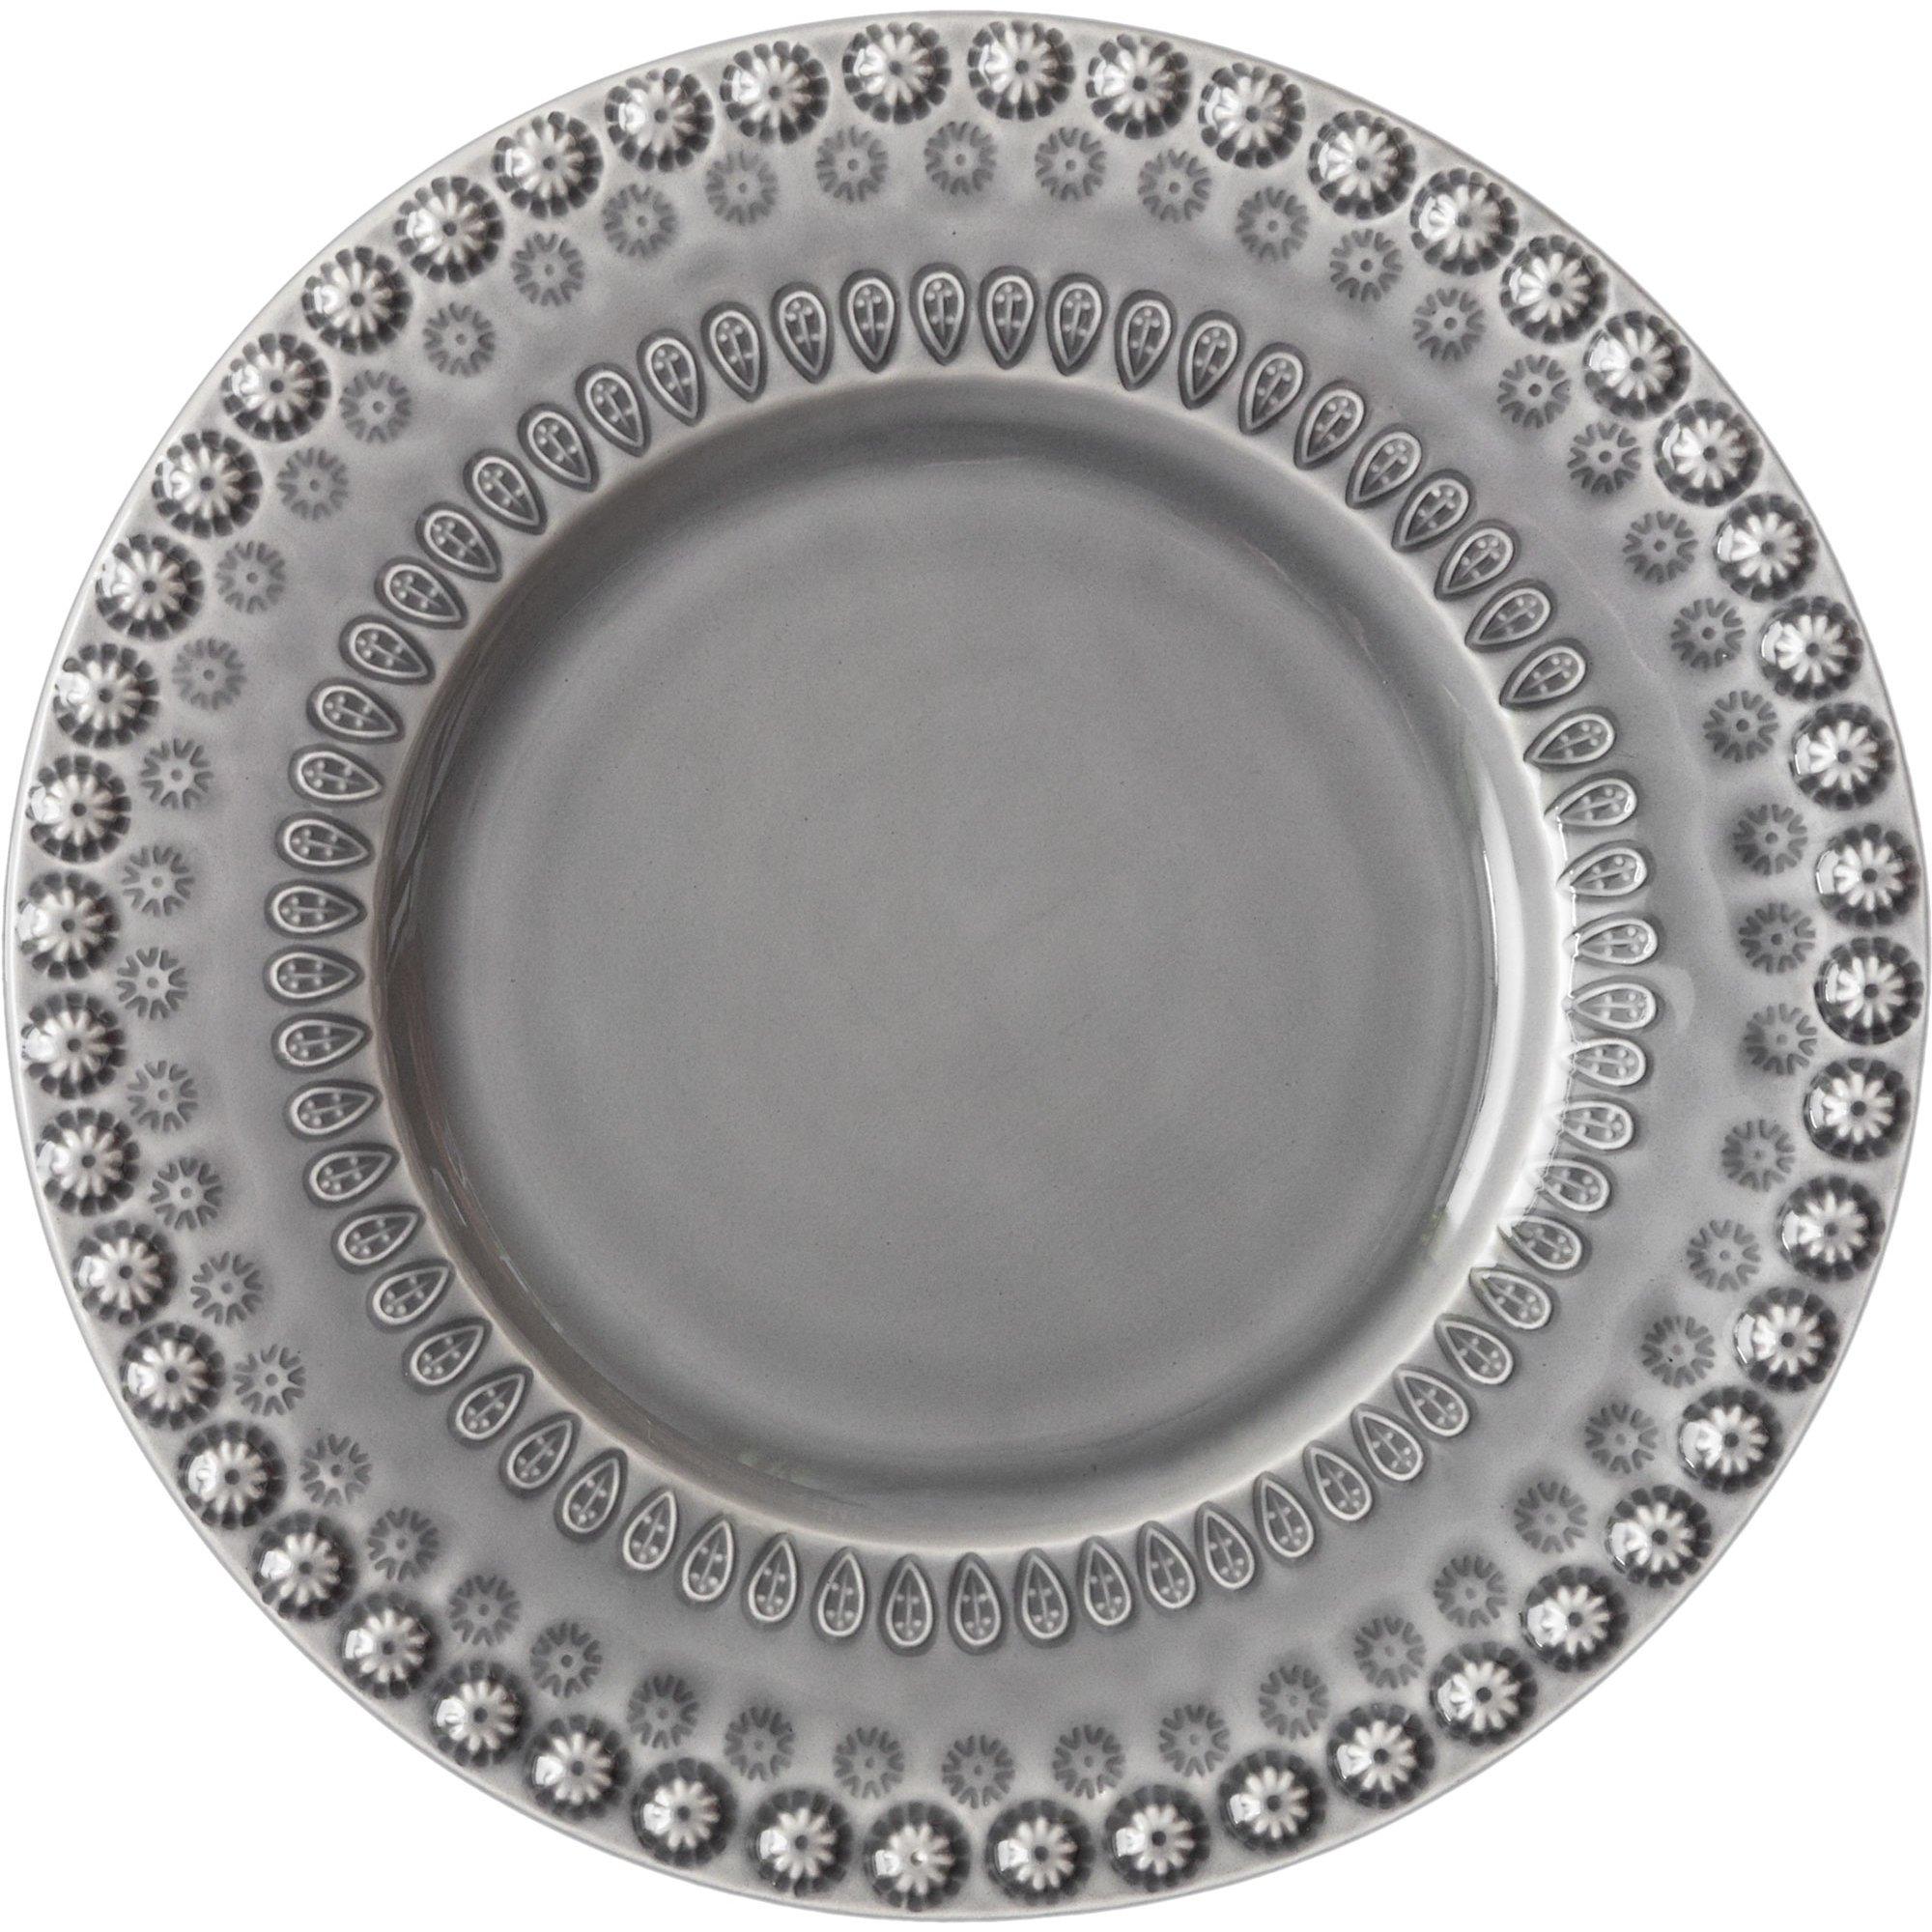 PotteryJo Daisy Salladstallrik 2 st Soft grey